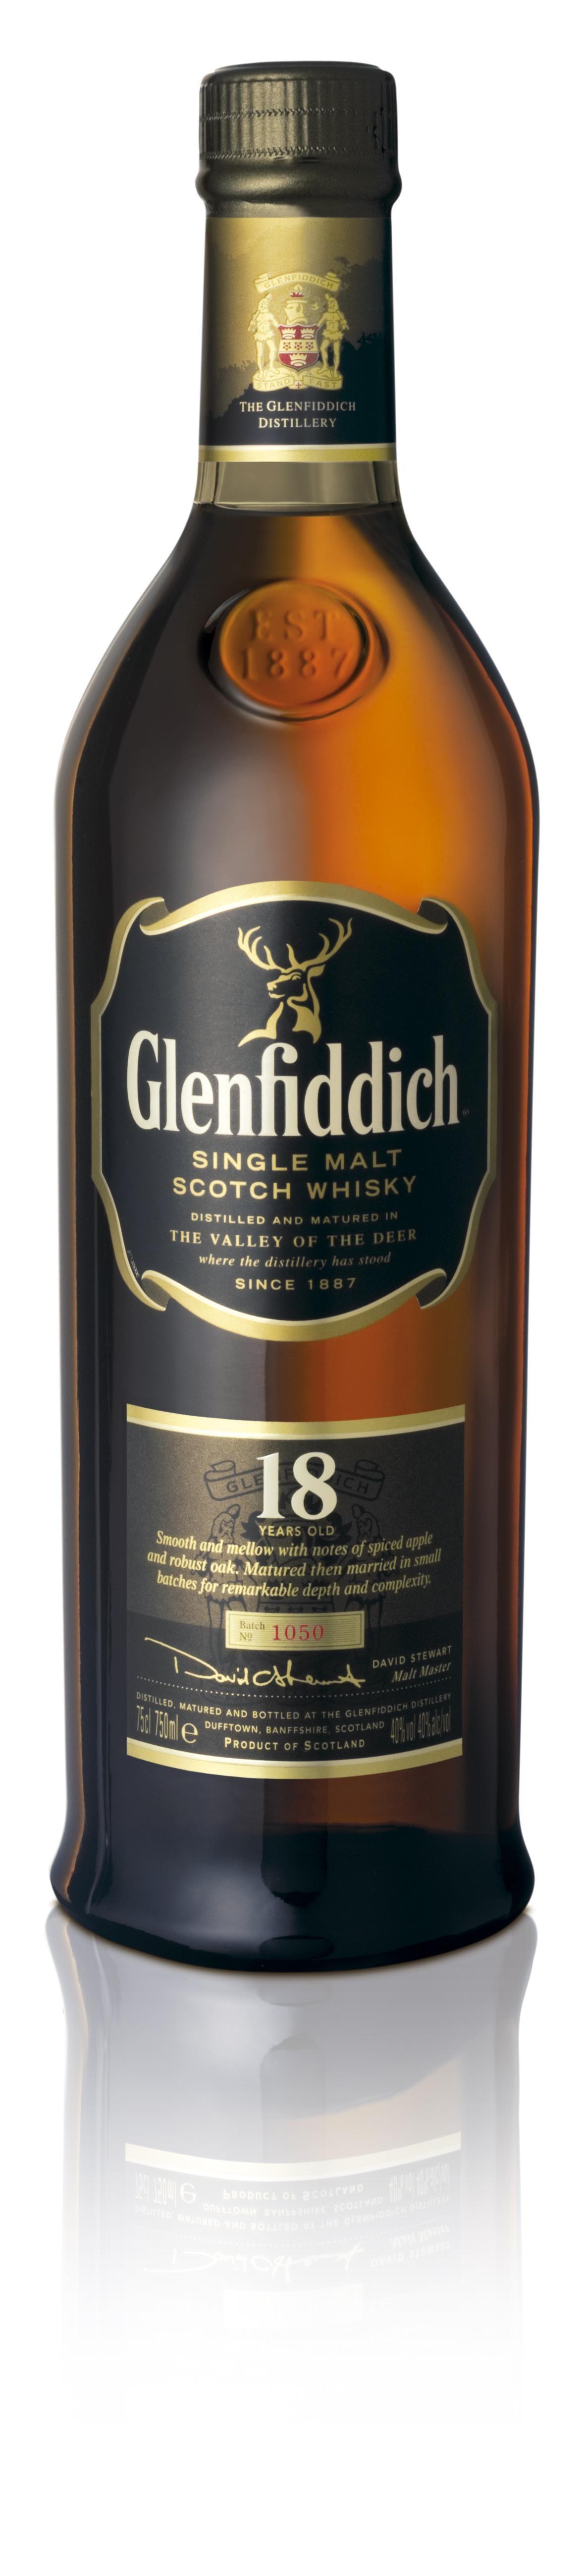 Glenfiddich 18 Ans d'Age 70cl 40% Speyside Single Malt Whisky Ecosse